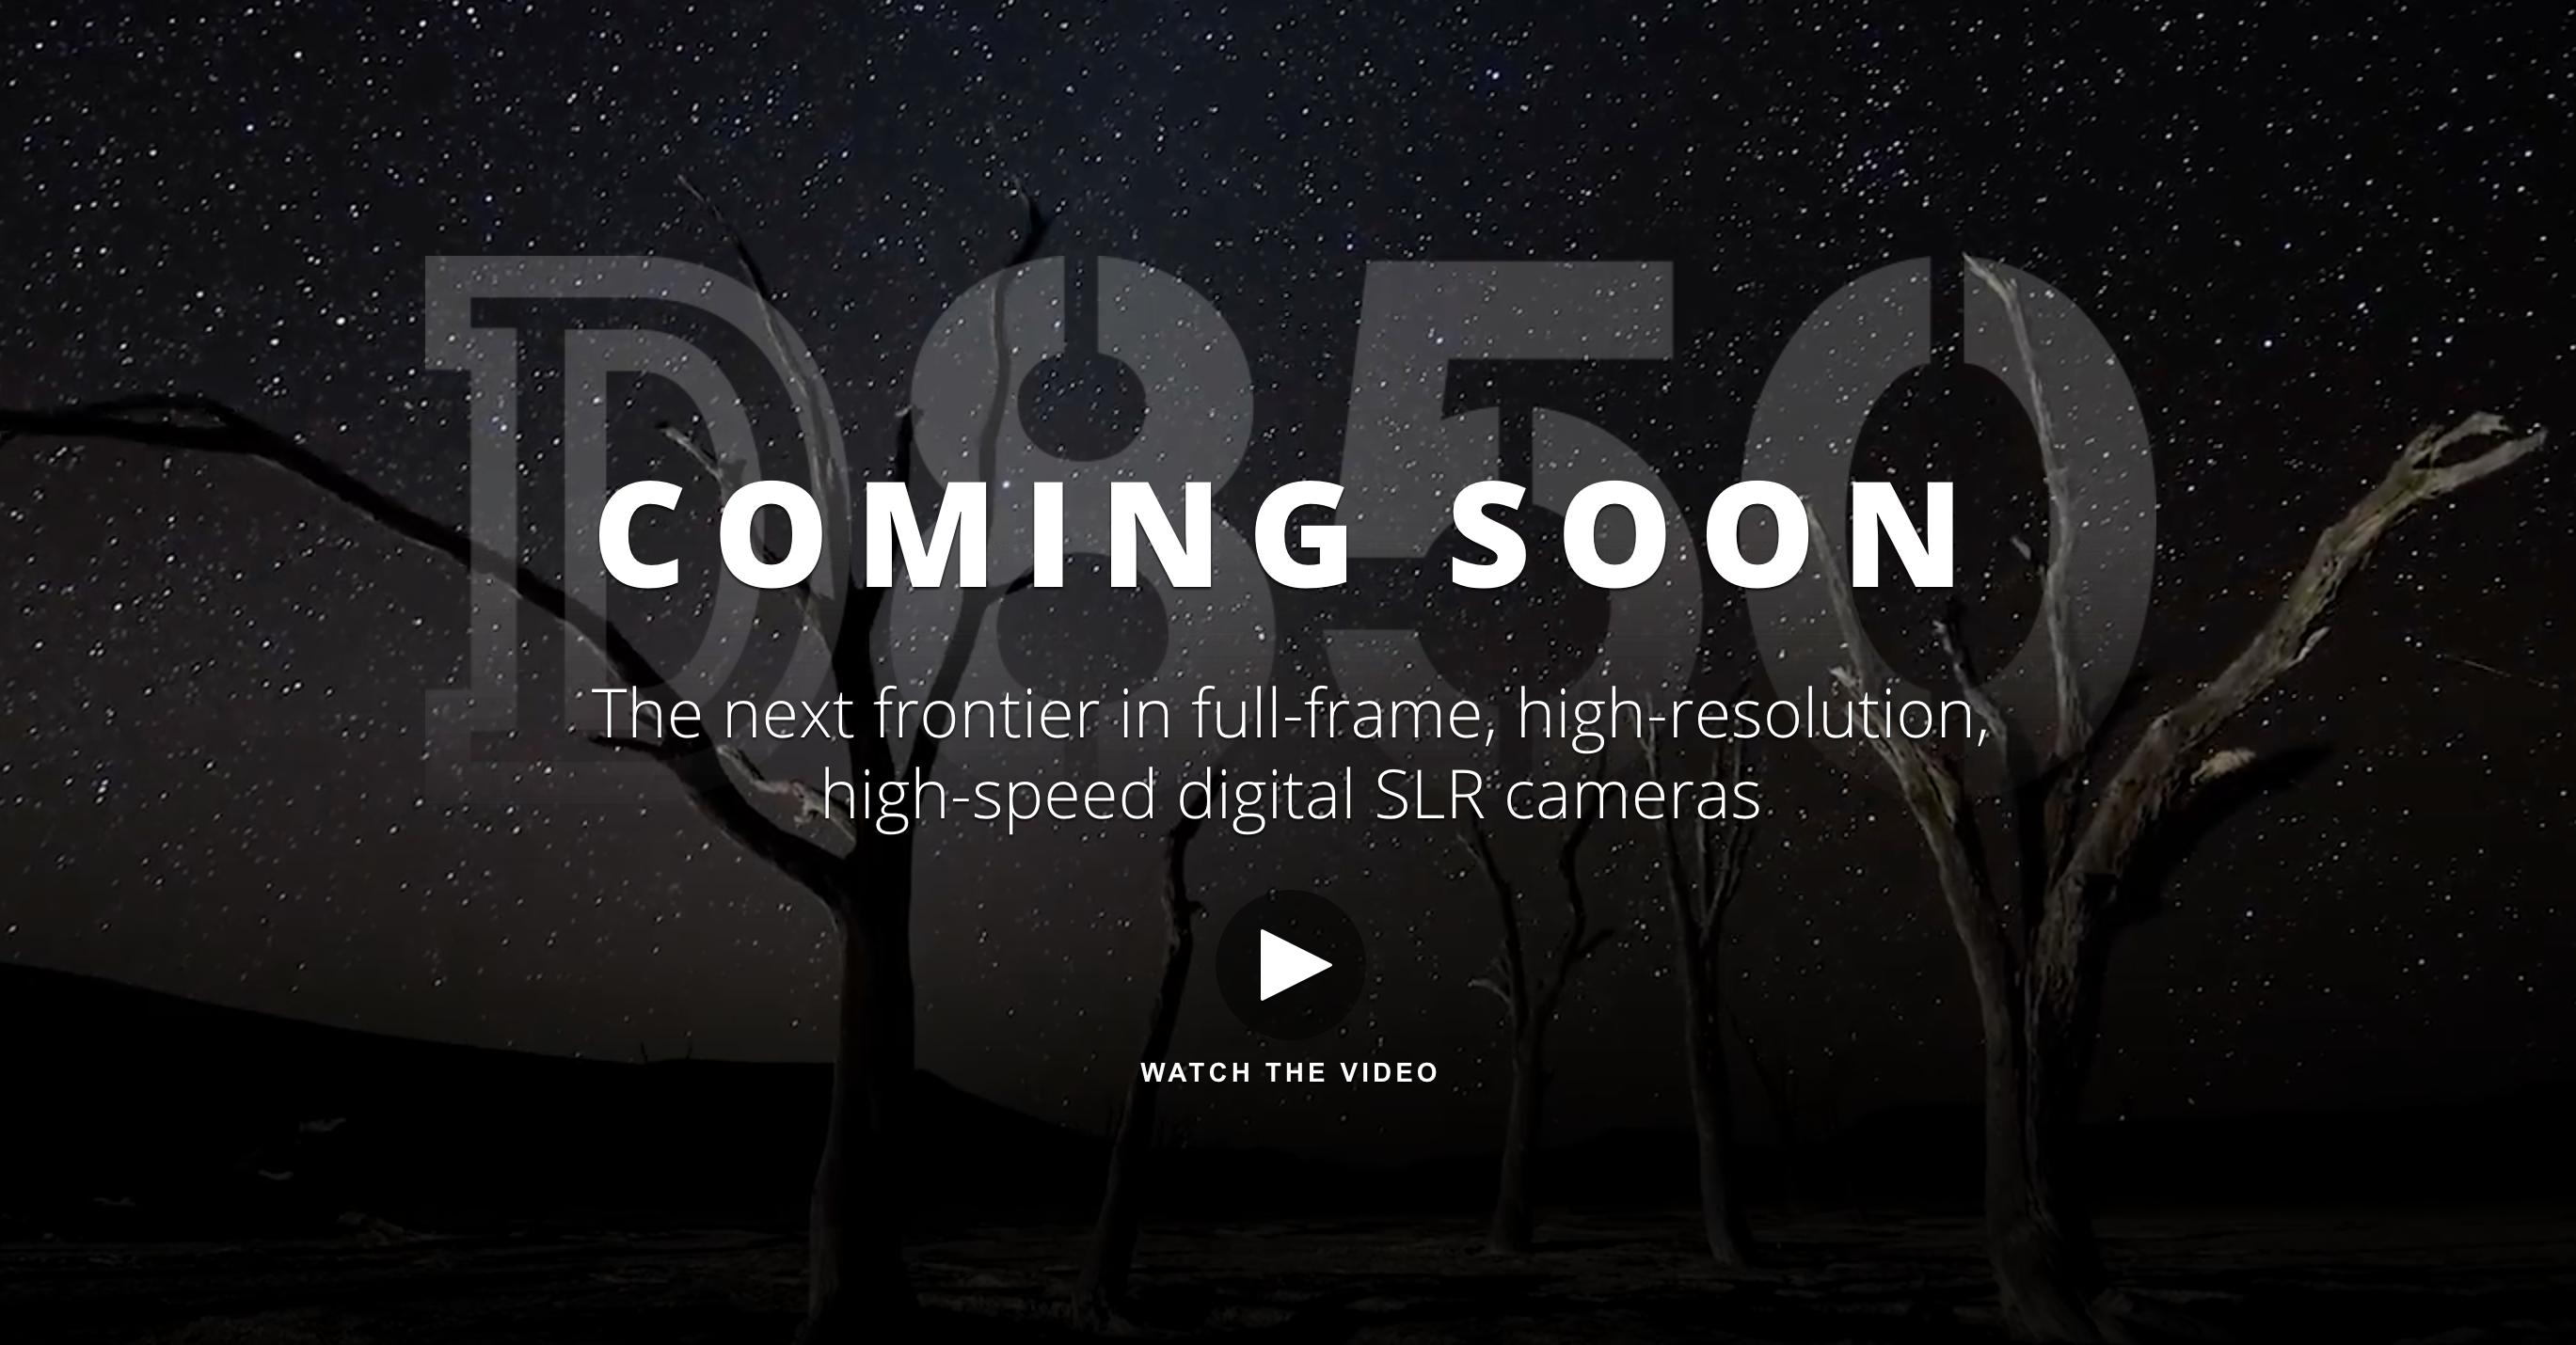 Nikon D850 is Coming!